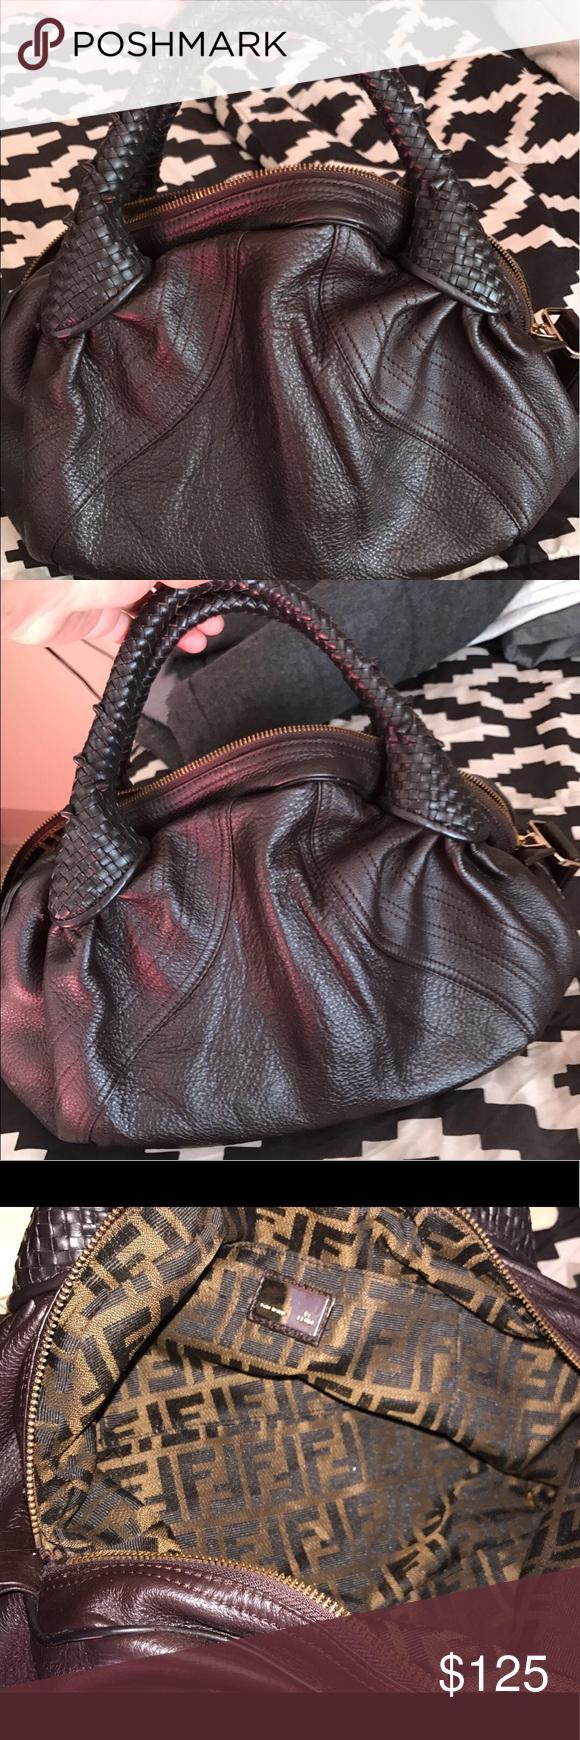 ... promo code fendi mini spy bag great condition fendi mini spy bag im the  third owner ... 8fceb46fec